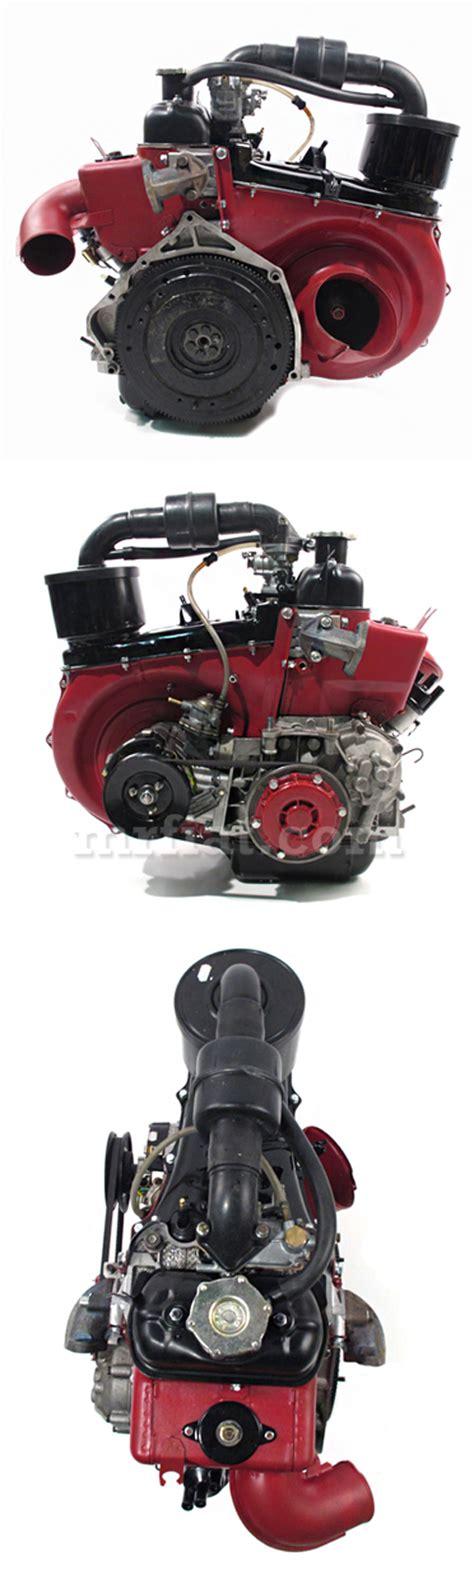 Mr Fiat channing s mercedes 280 se cabriolet 3l5 1970 arri re